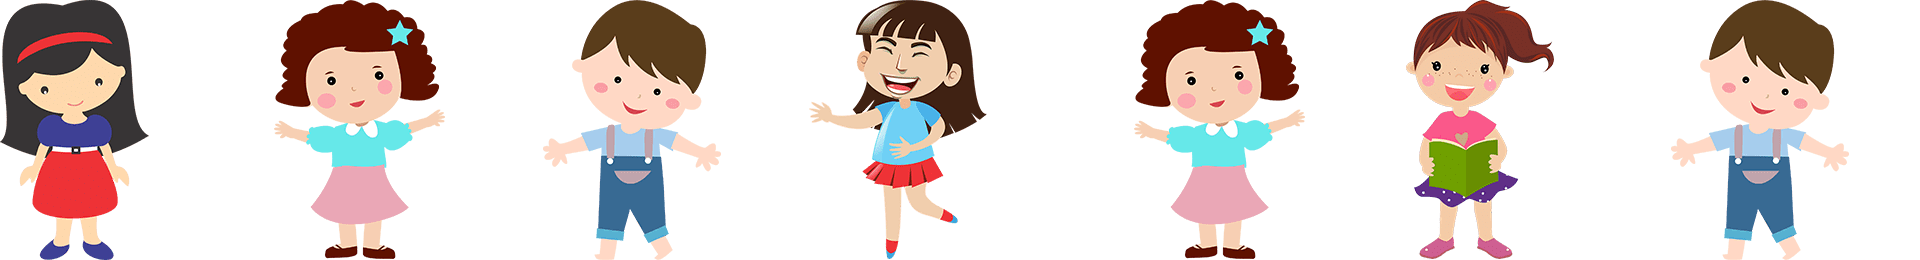 http://mdou02.uoura.ru/images/kindergarten/jump1.png